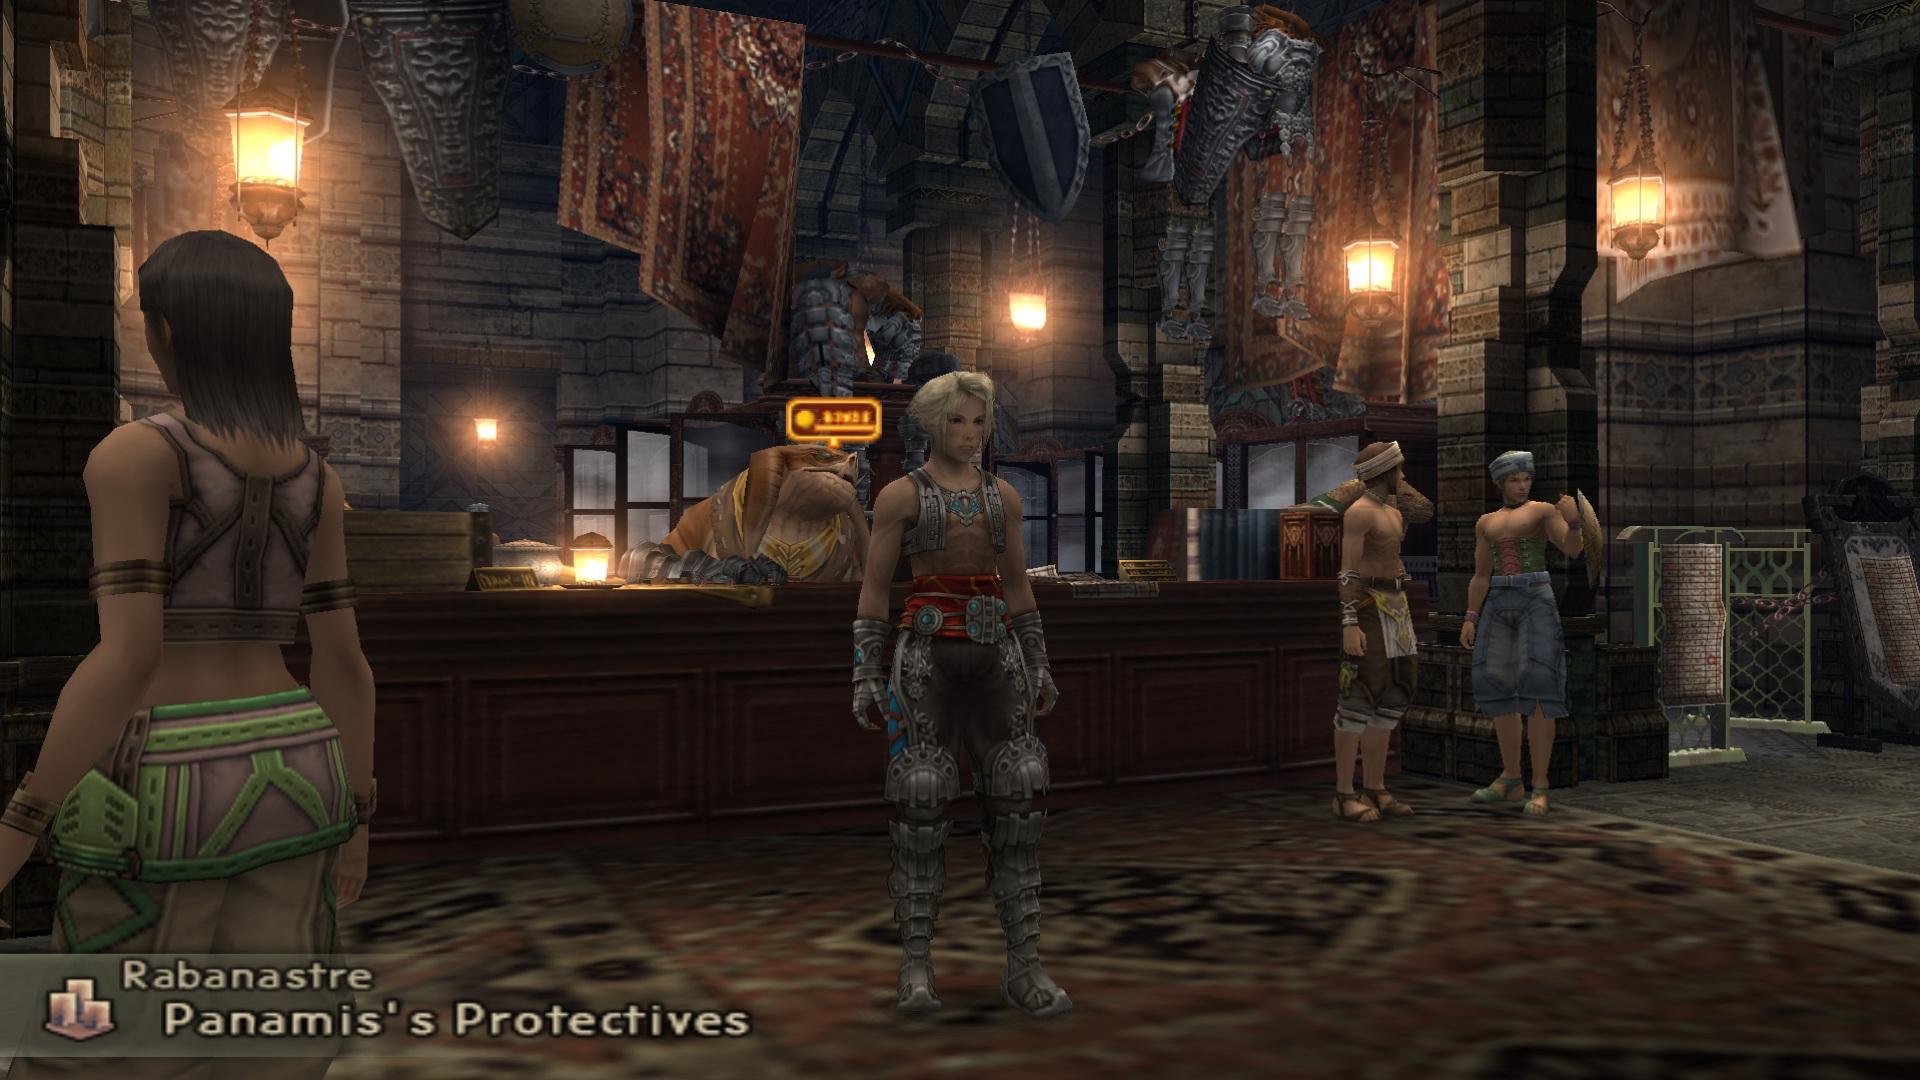 final fantasy 12 bazaar loot guide